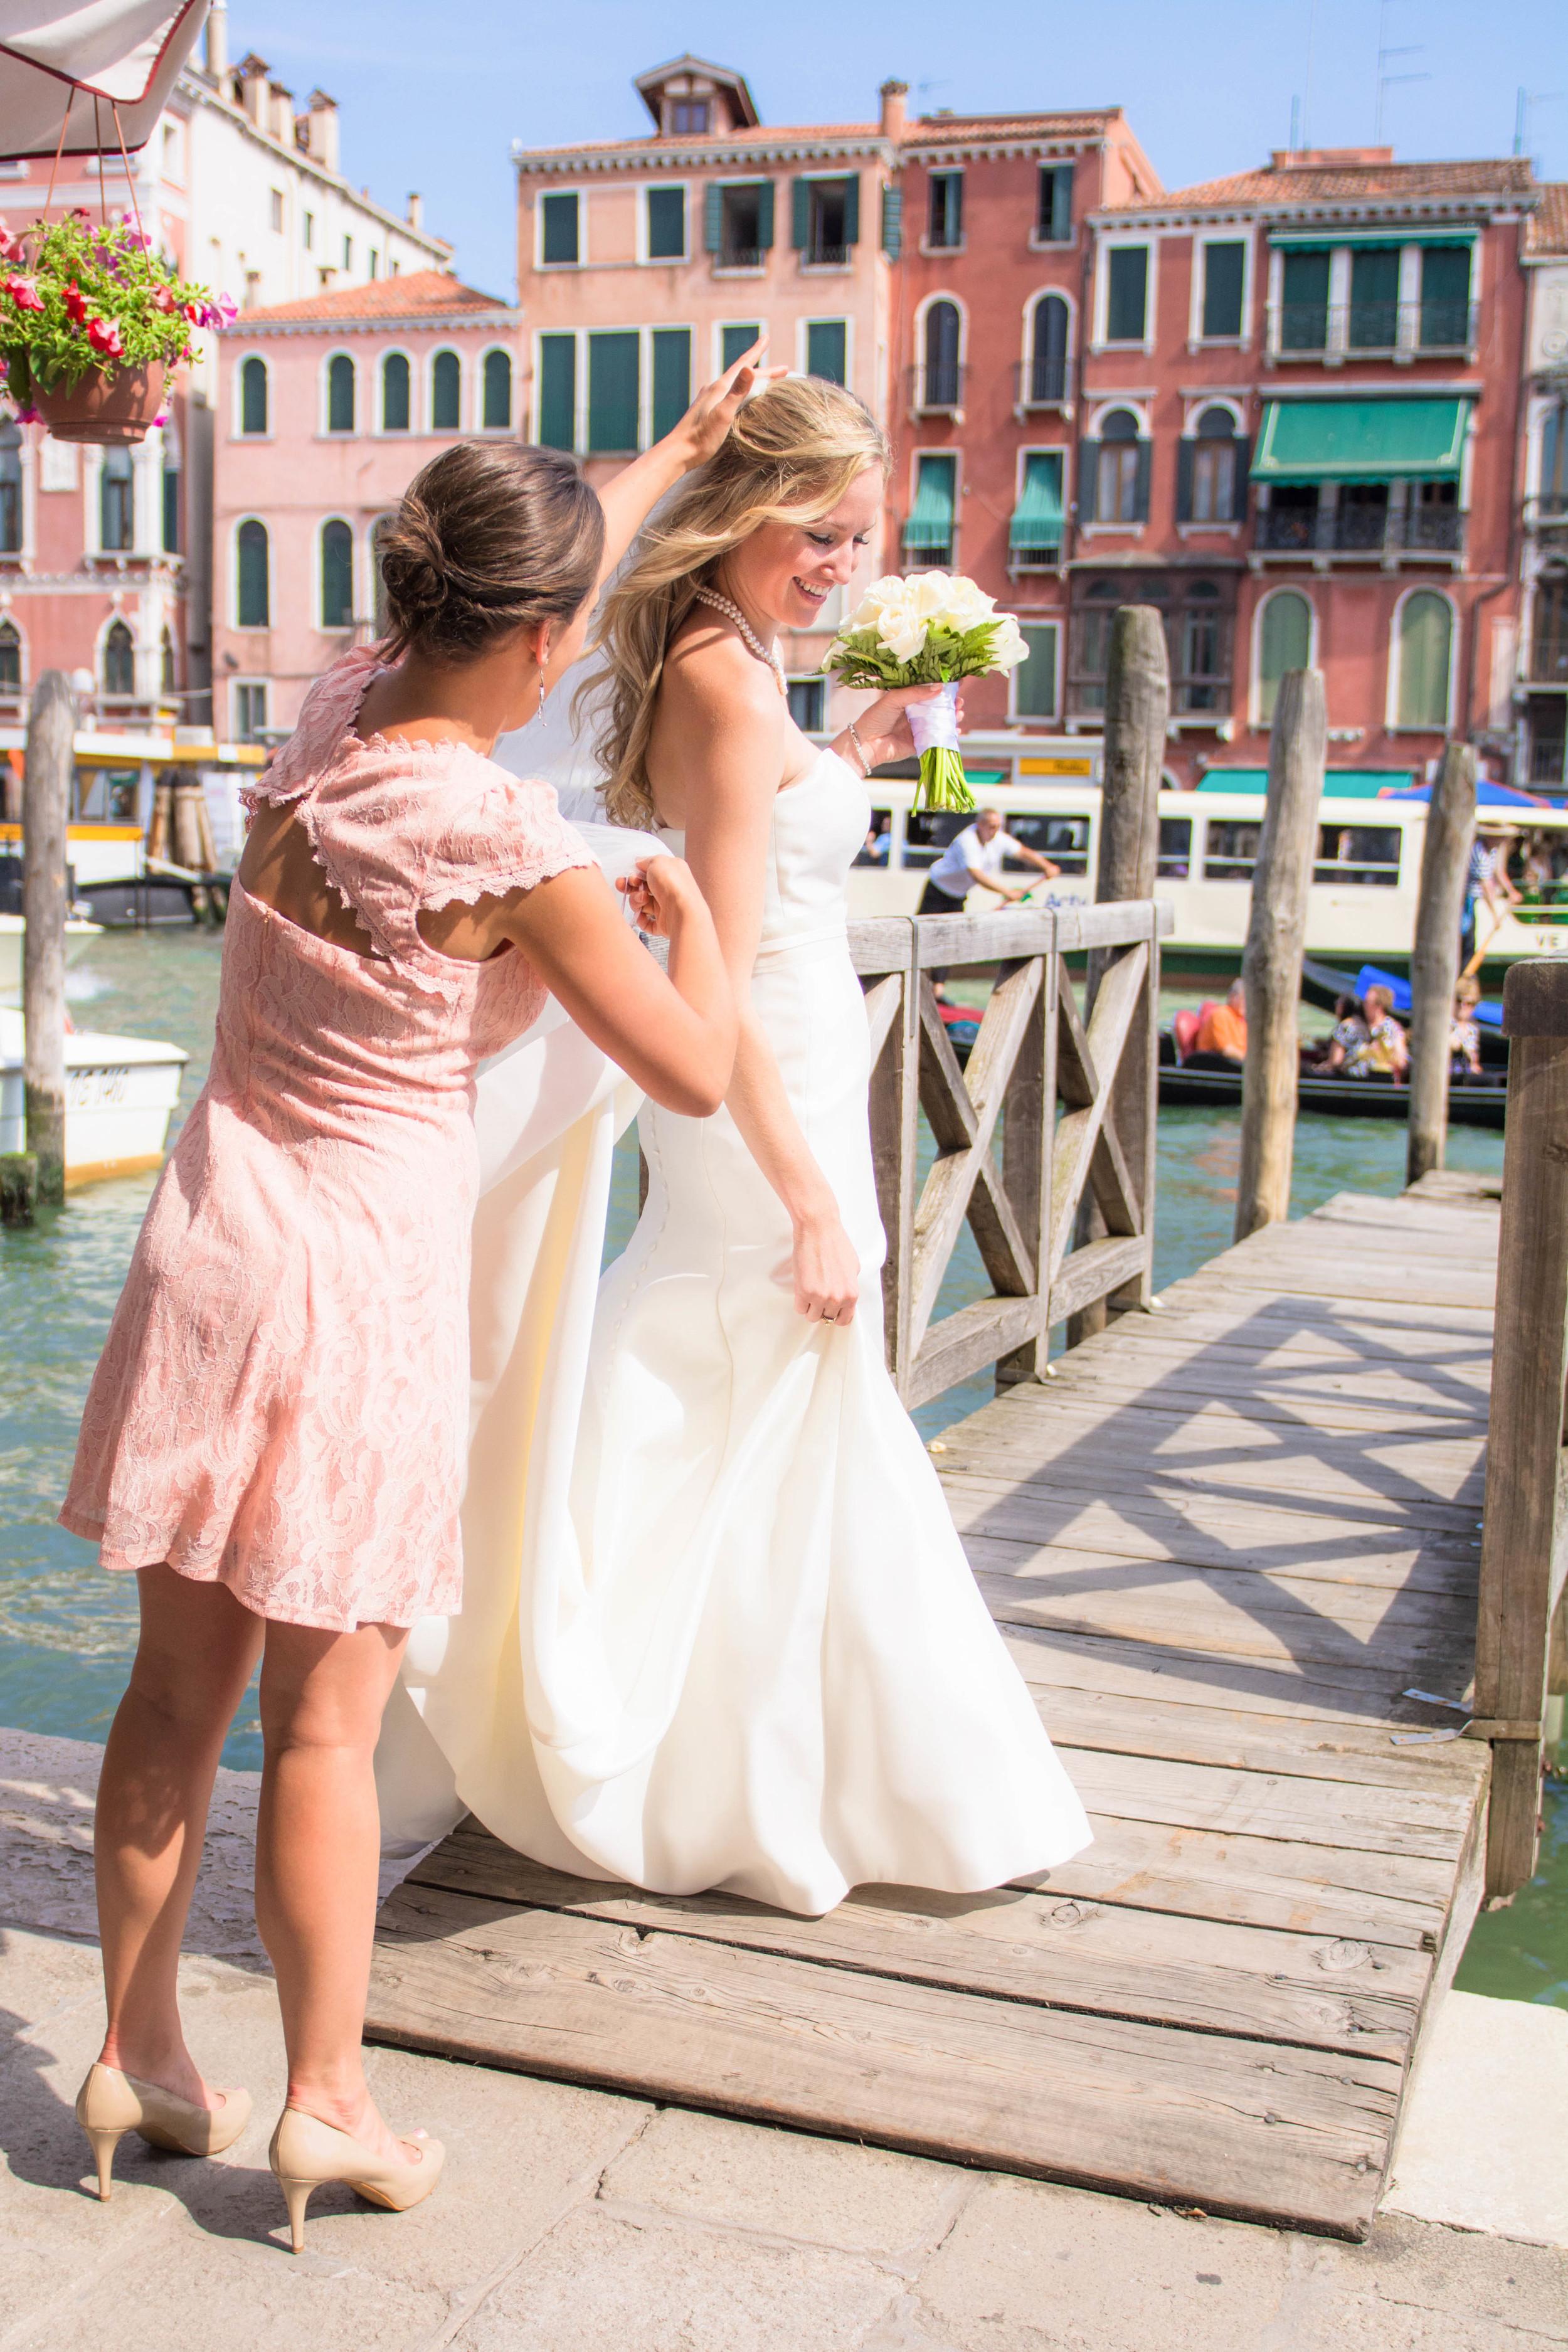 Venice Italy Wedding Canals